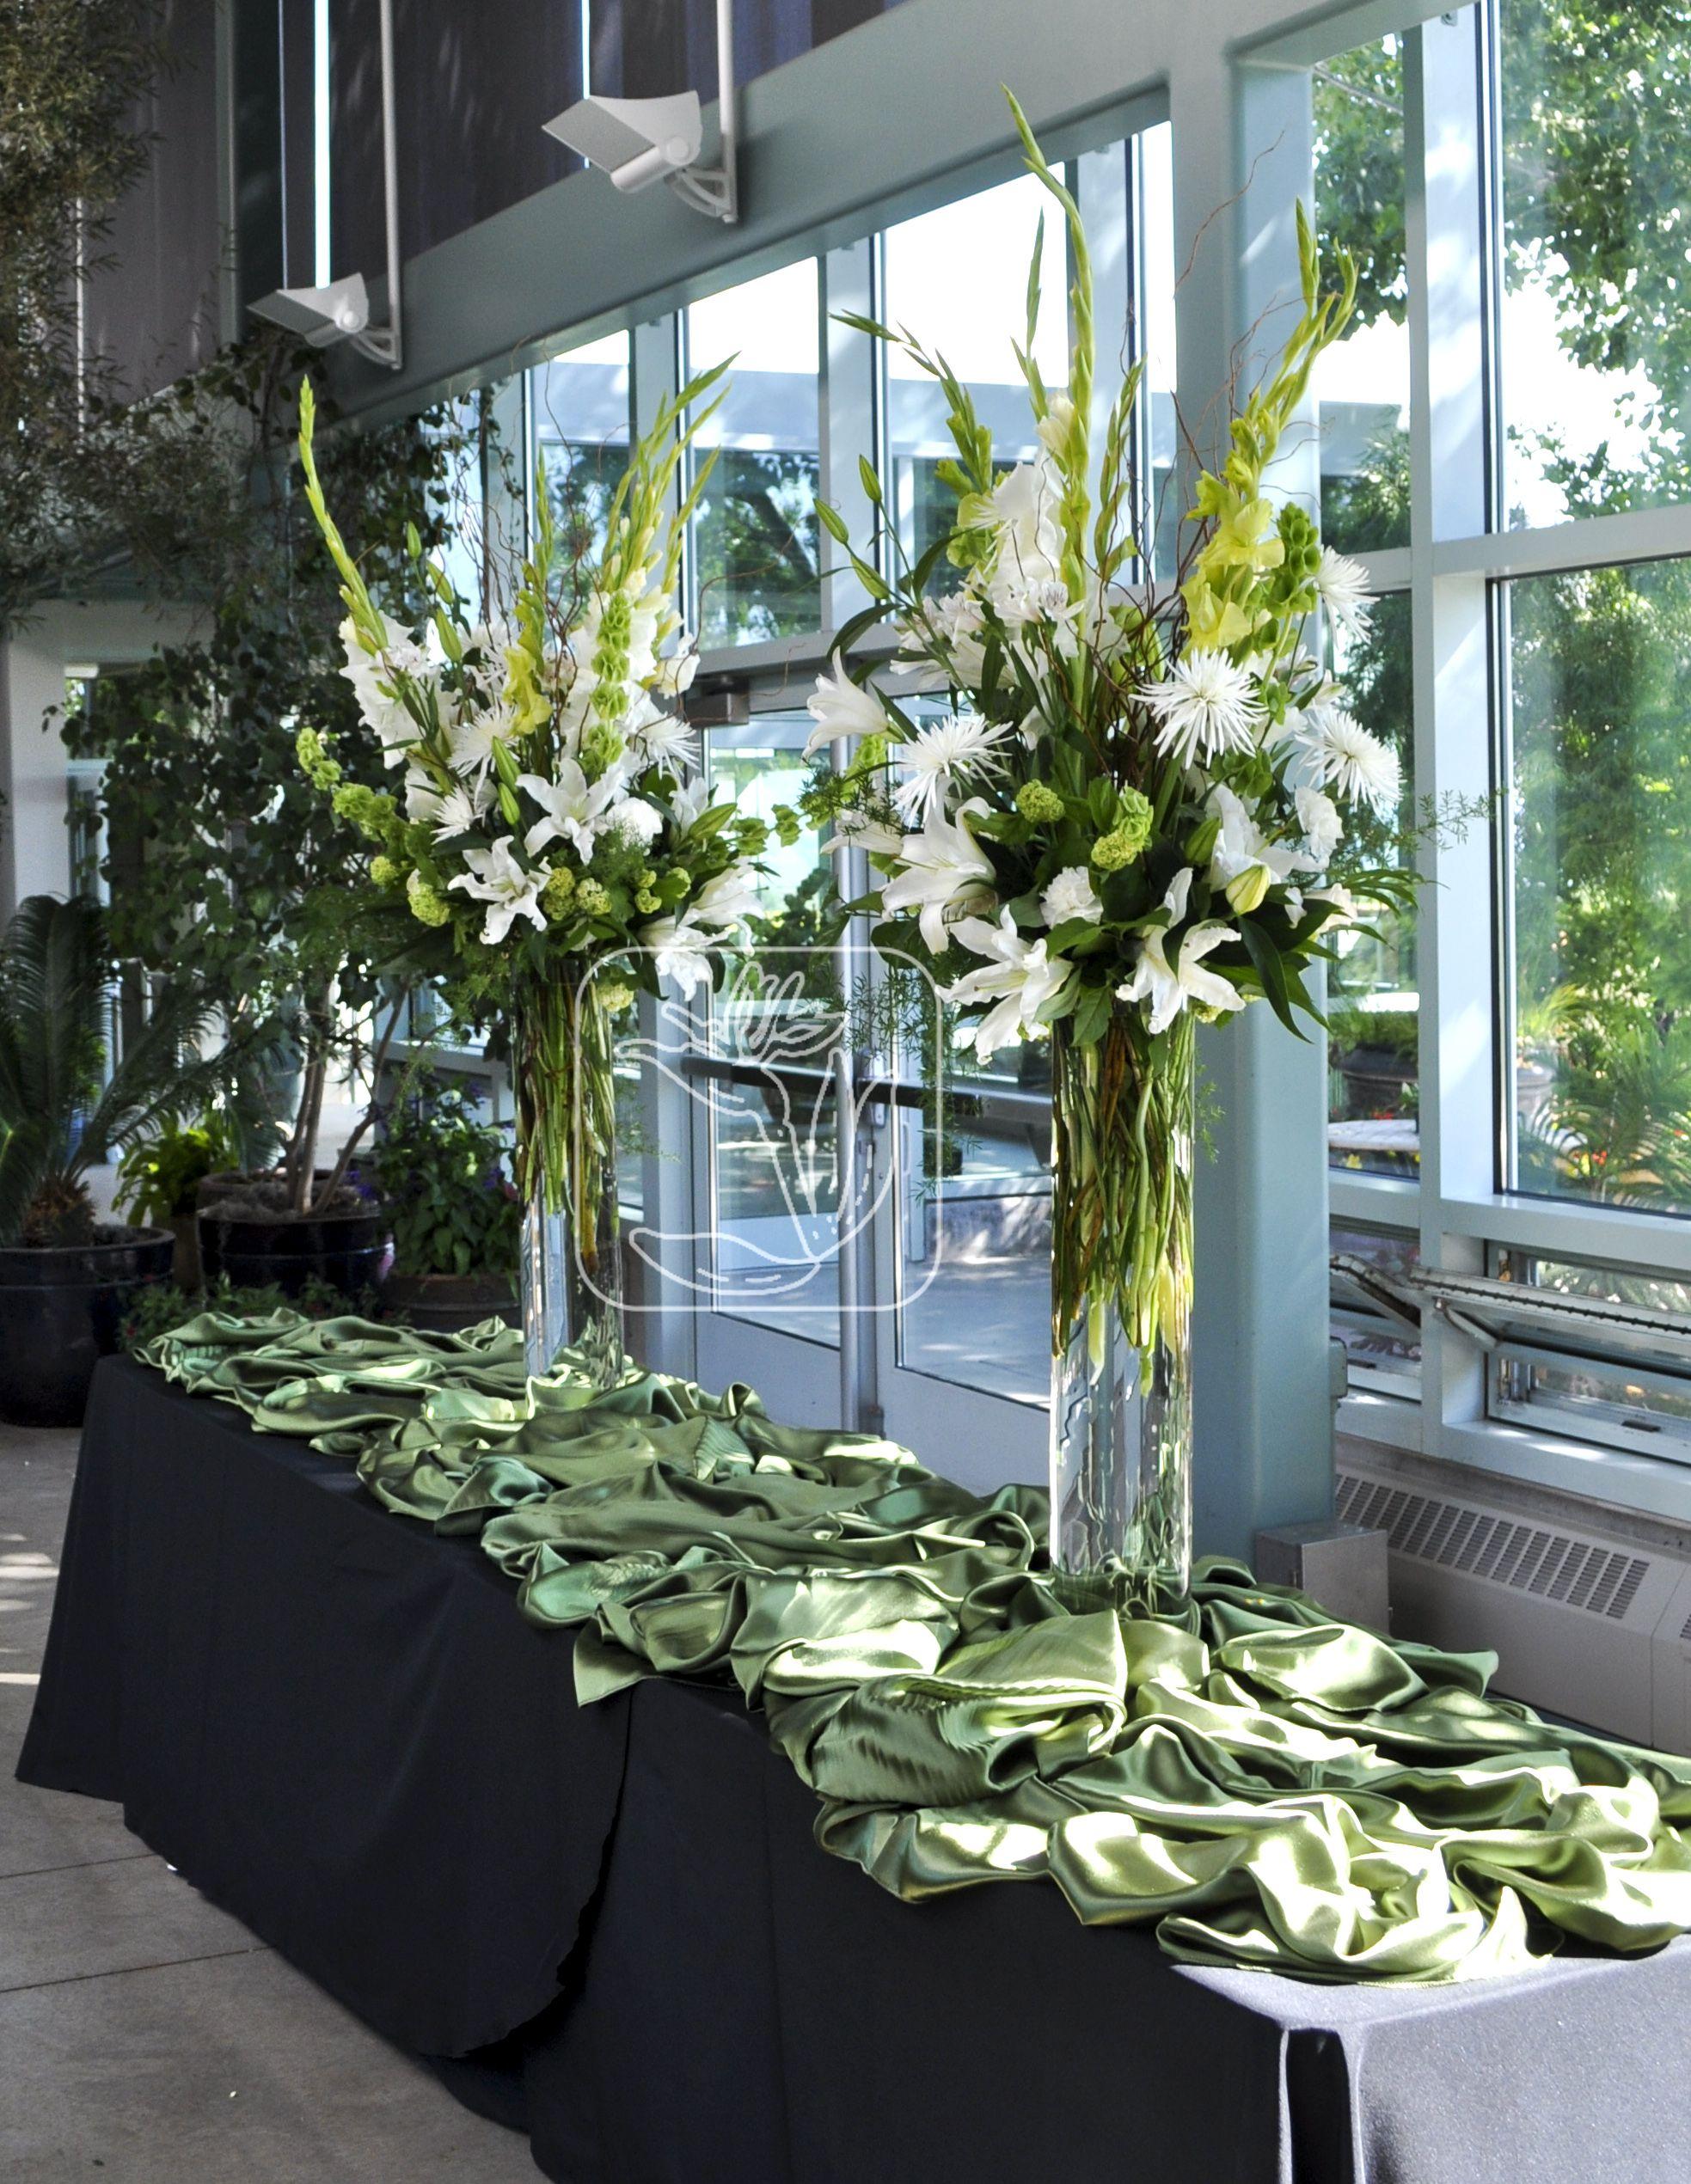 buffet table display